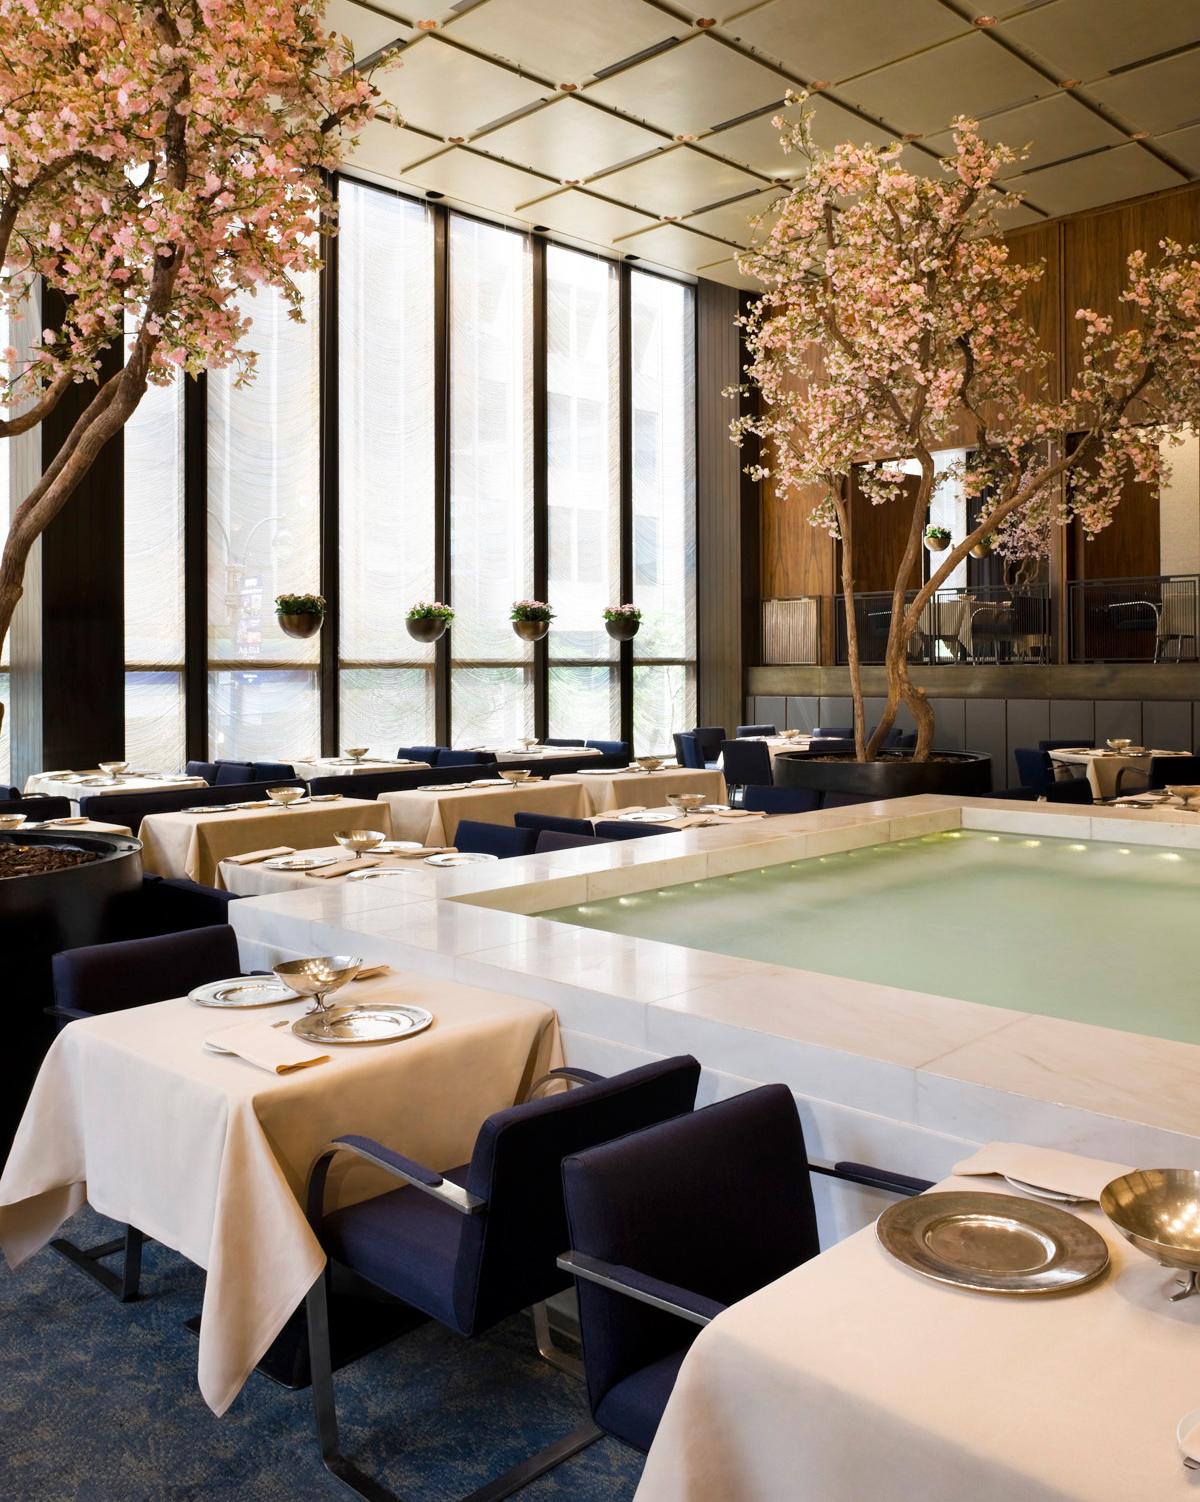 mad-men-wedding-four-seasons-pool-room-spring-0315.jpg